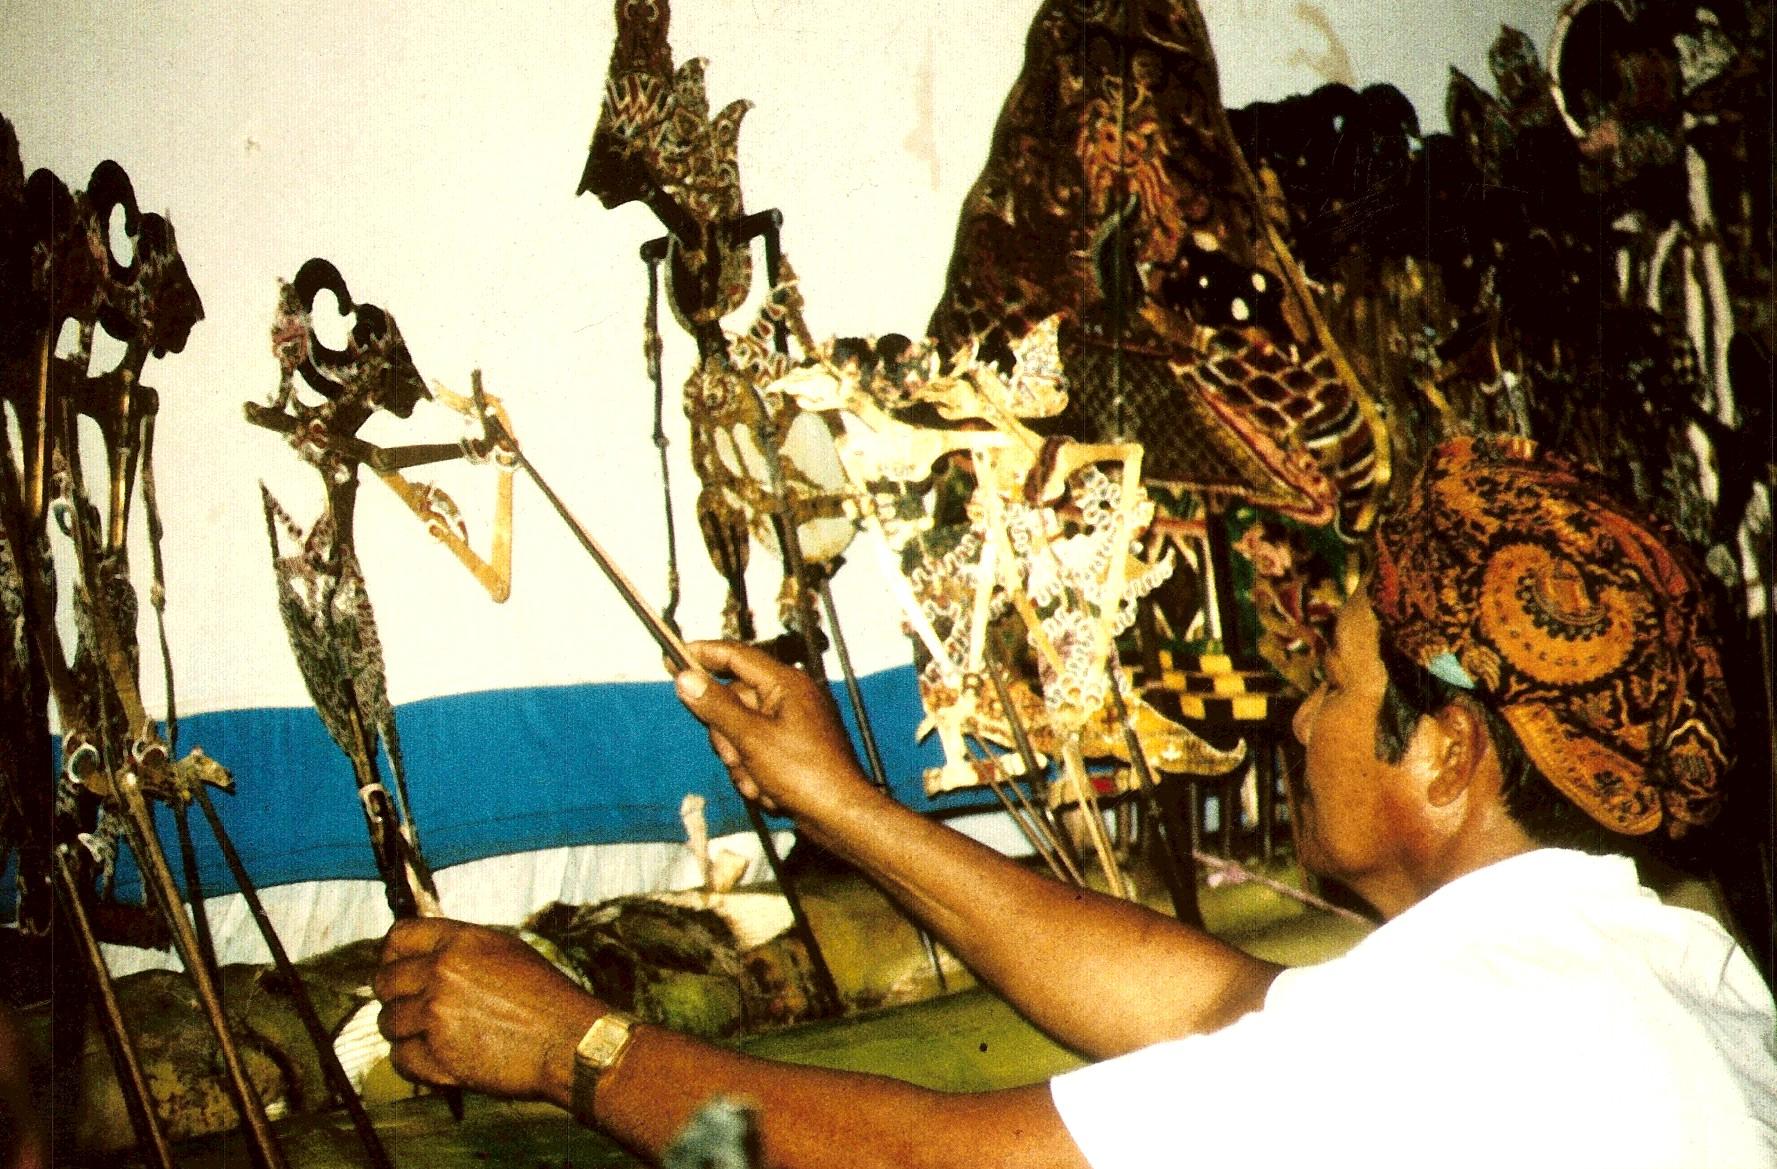 Indonesian shadow puppet indonesian traditional culture - Artesania de indonesia ...